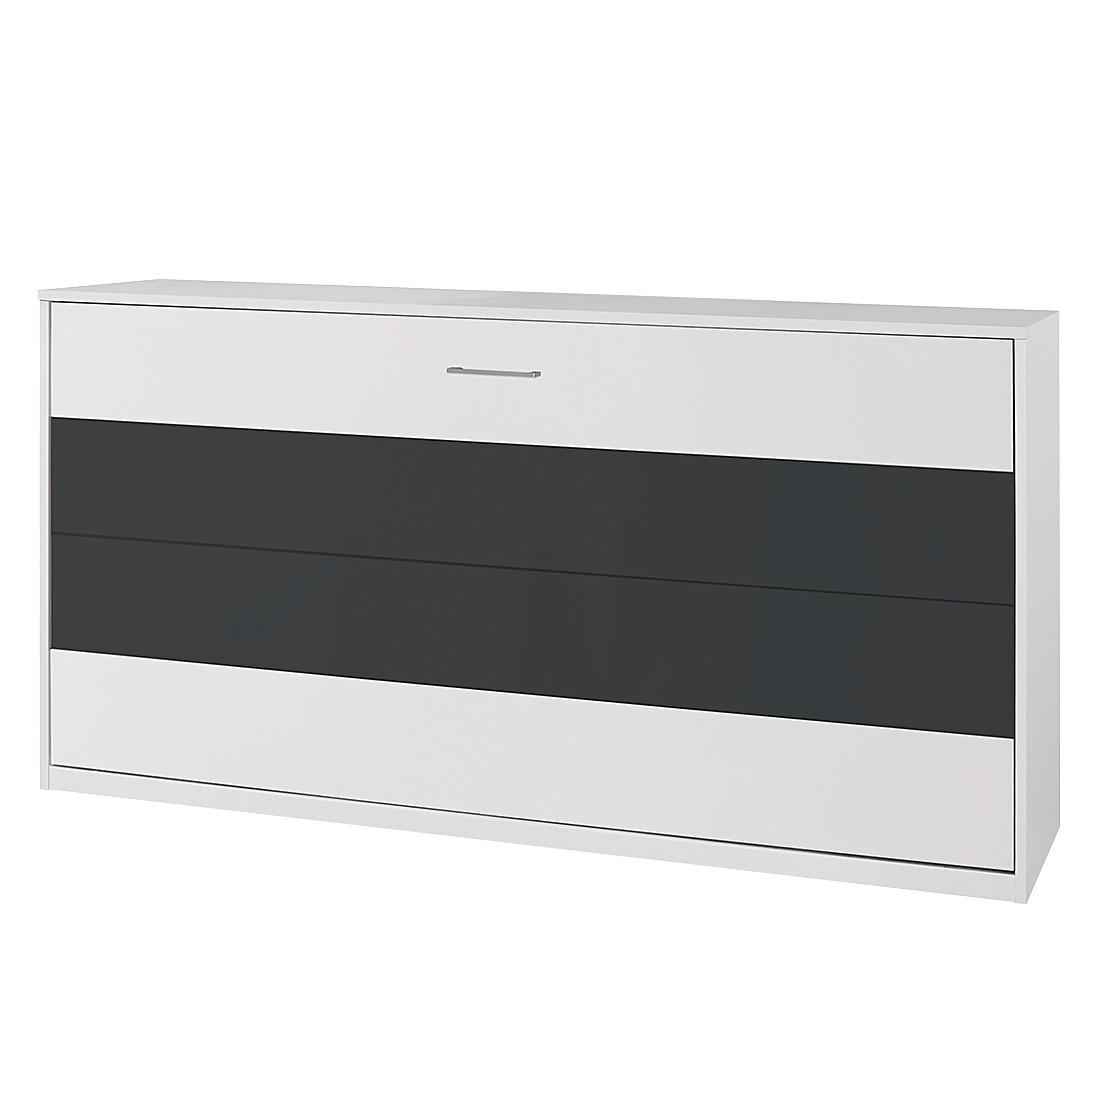 Lit rabattable Albero Extra - Blanc alpin / Gris métallisé, Rauch